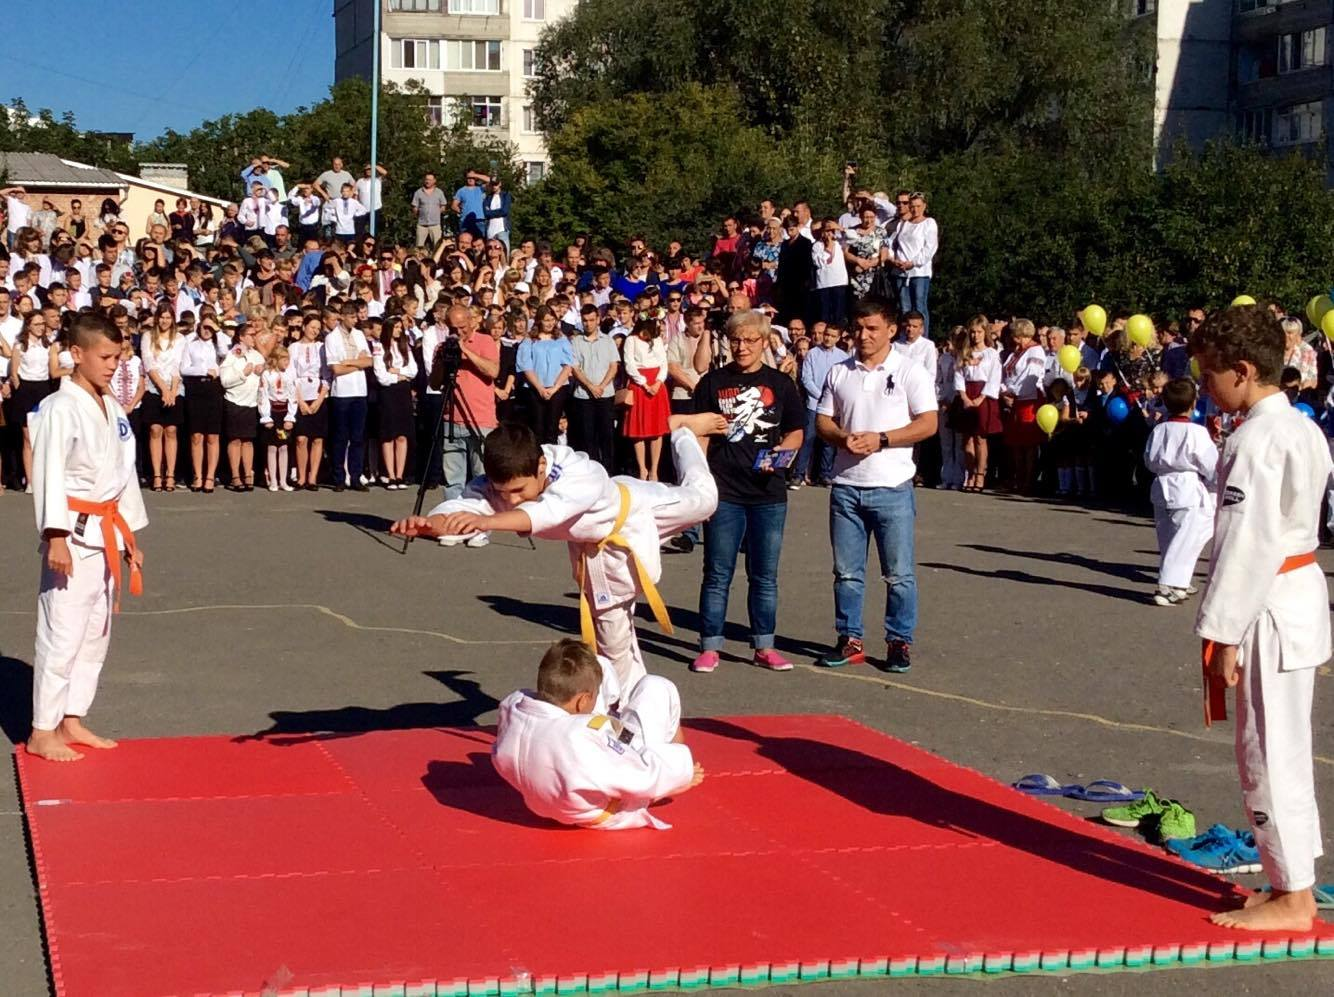 Хмельницький НВК№10 на Першовересень заполонили поліцейські - фото 8